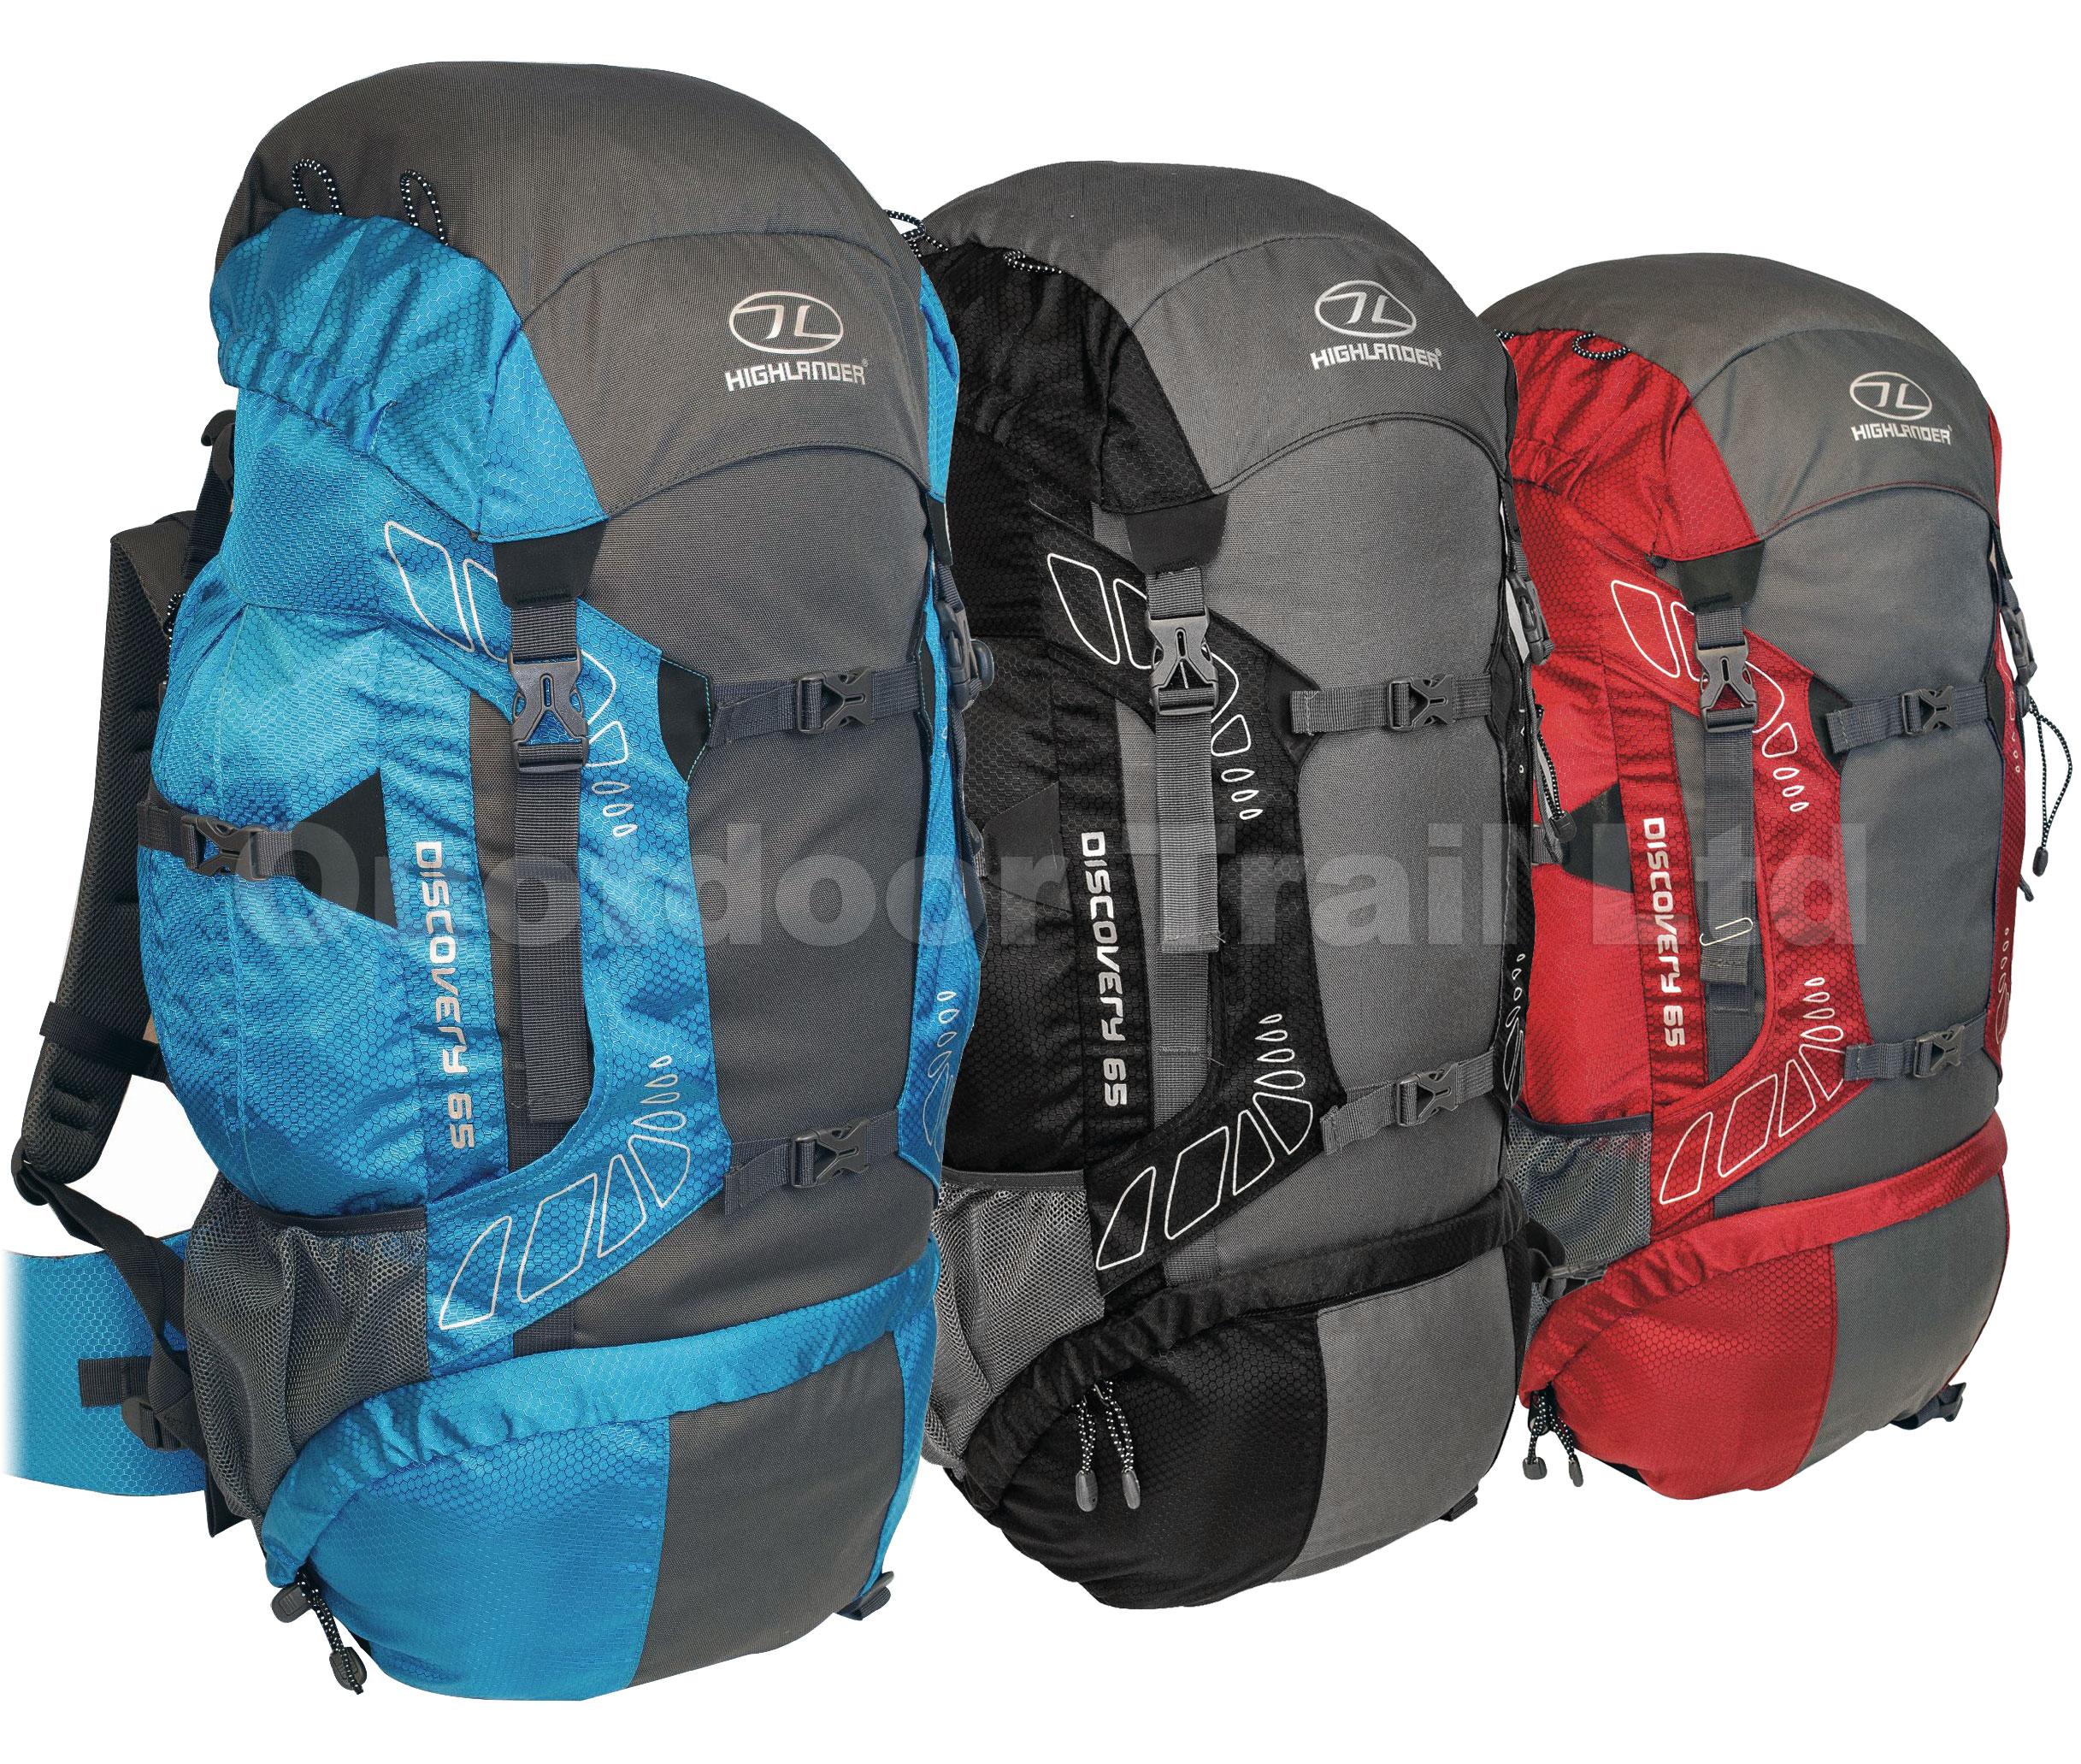 Highlander Discovery 65 Litre Walking Hiking Camping Backpack ...